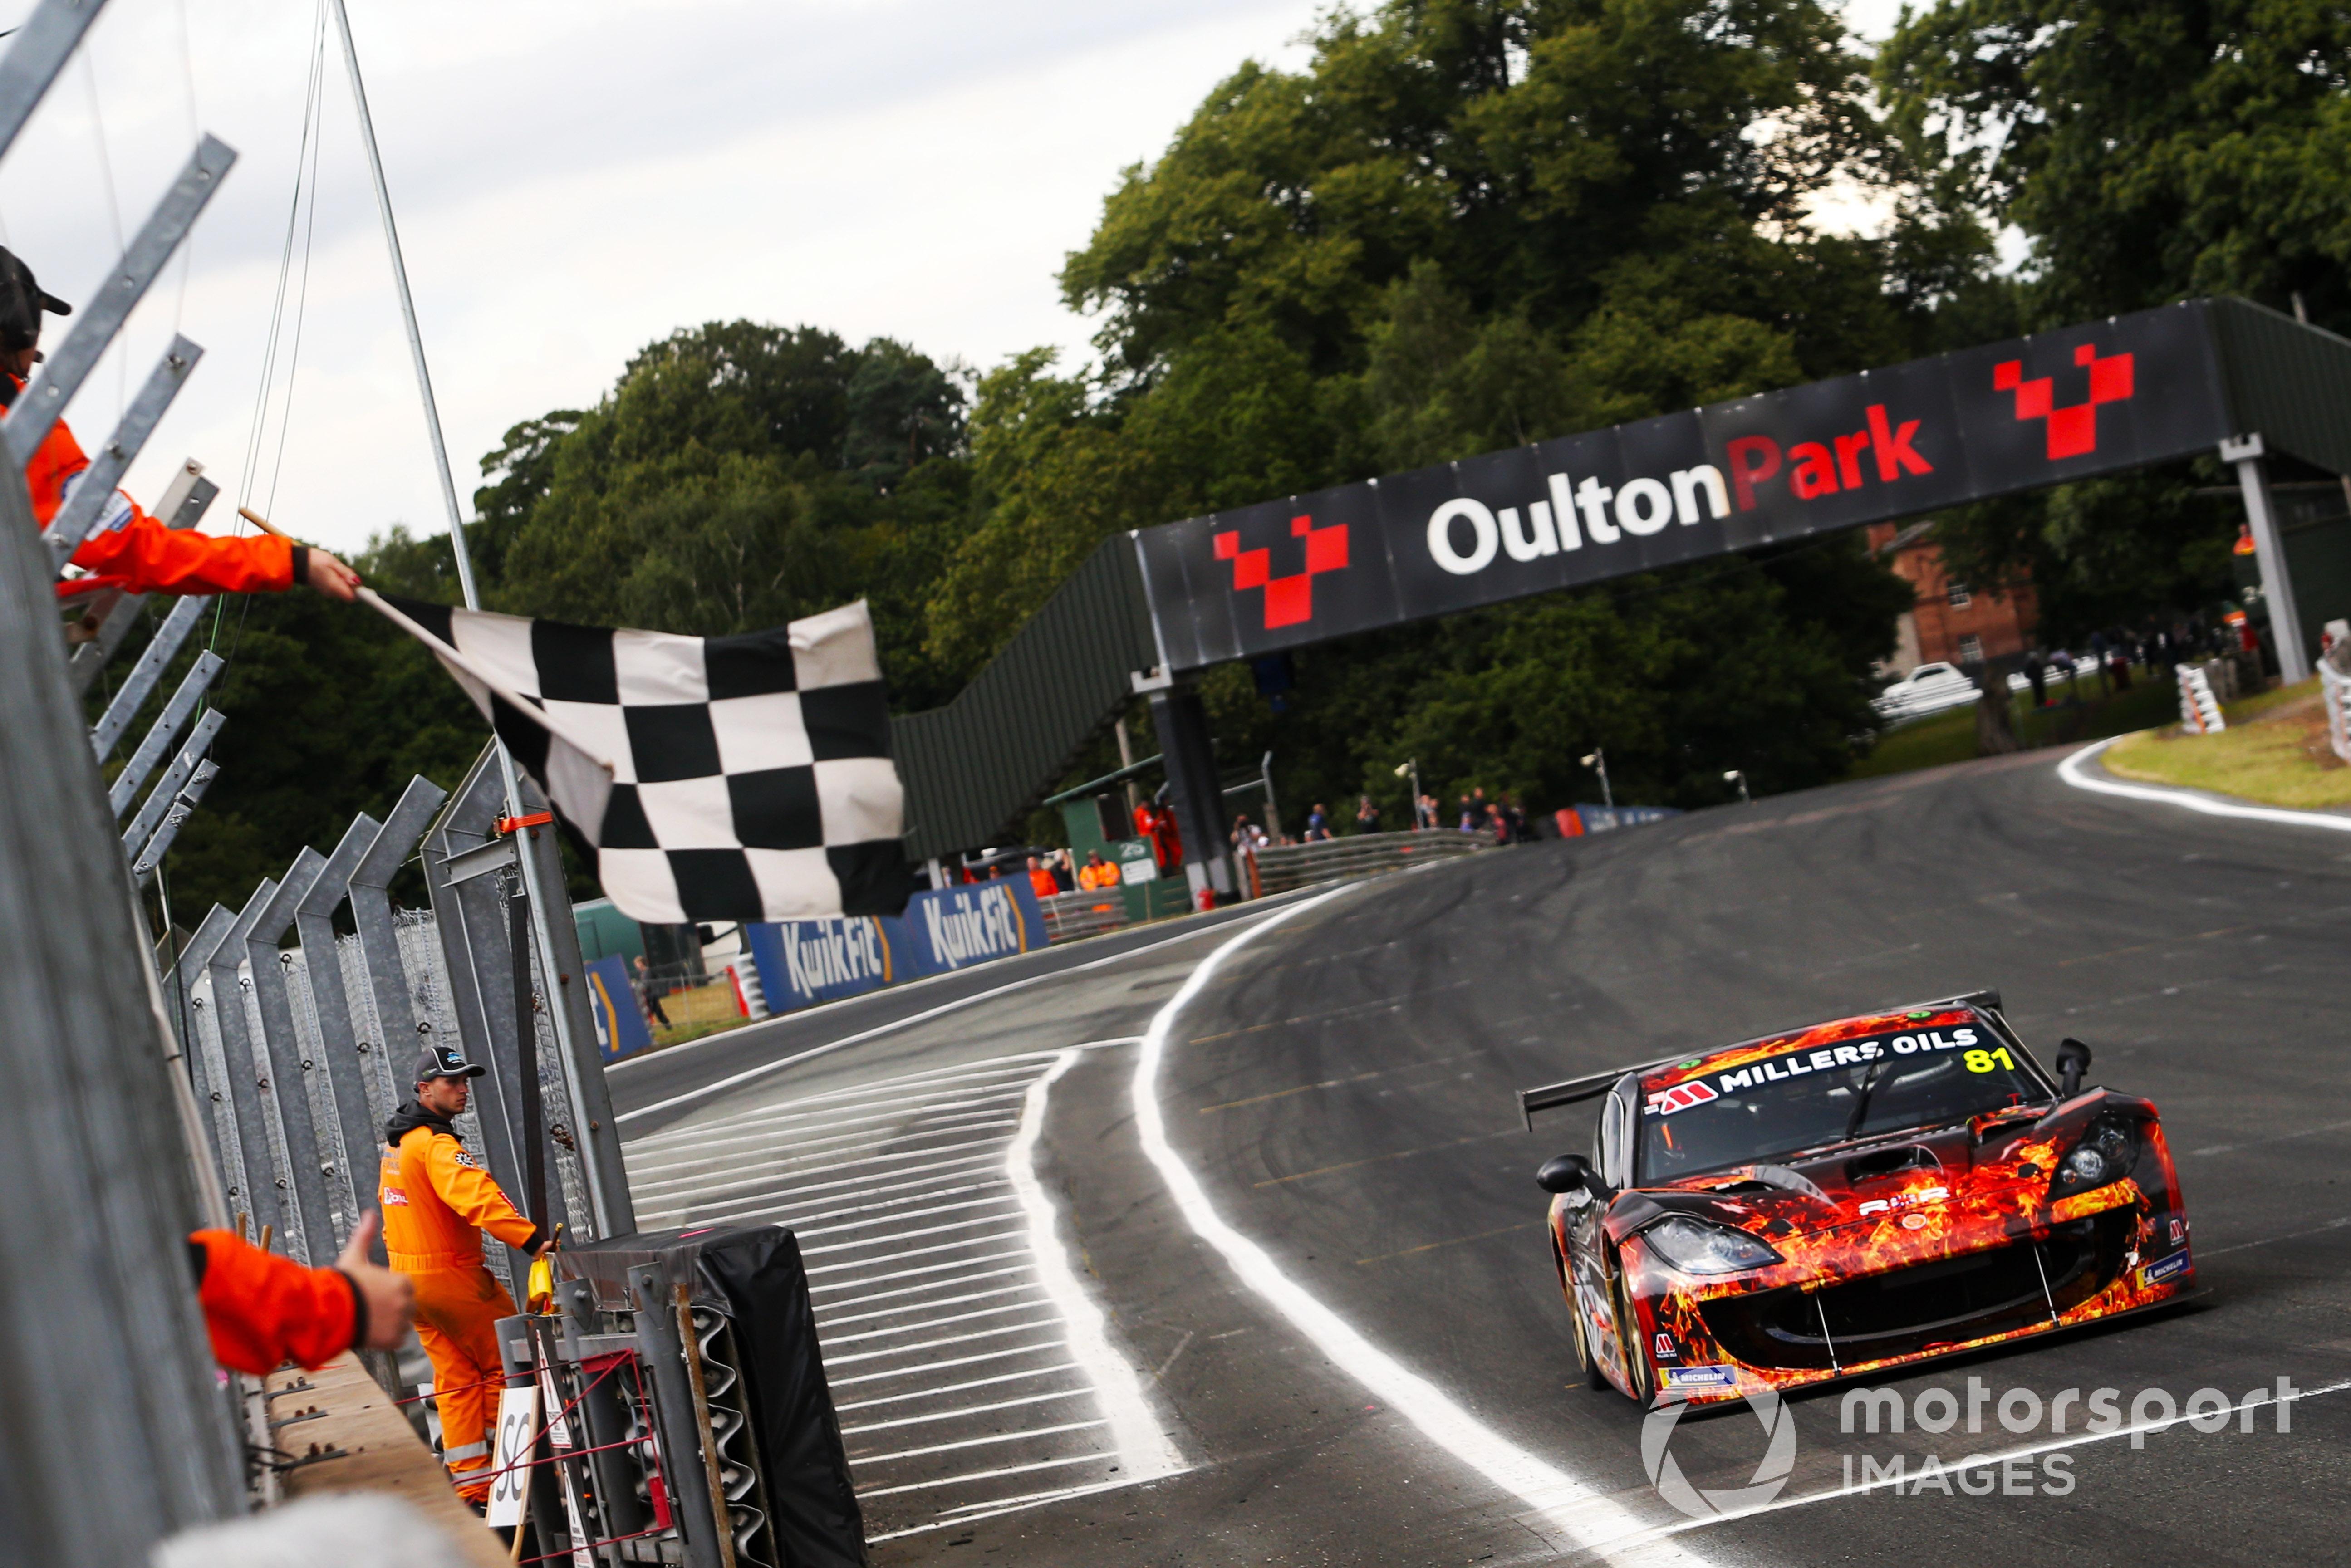 Tom Hibbert, Ginetta GT4 Supercup, Oulton Park 2021